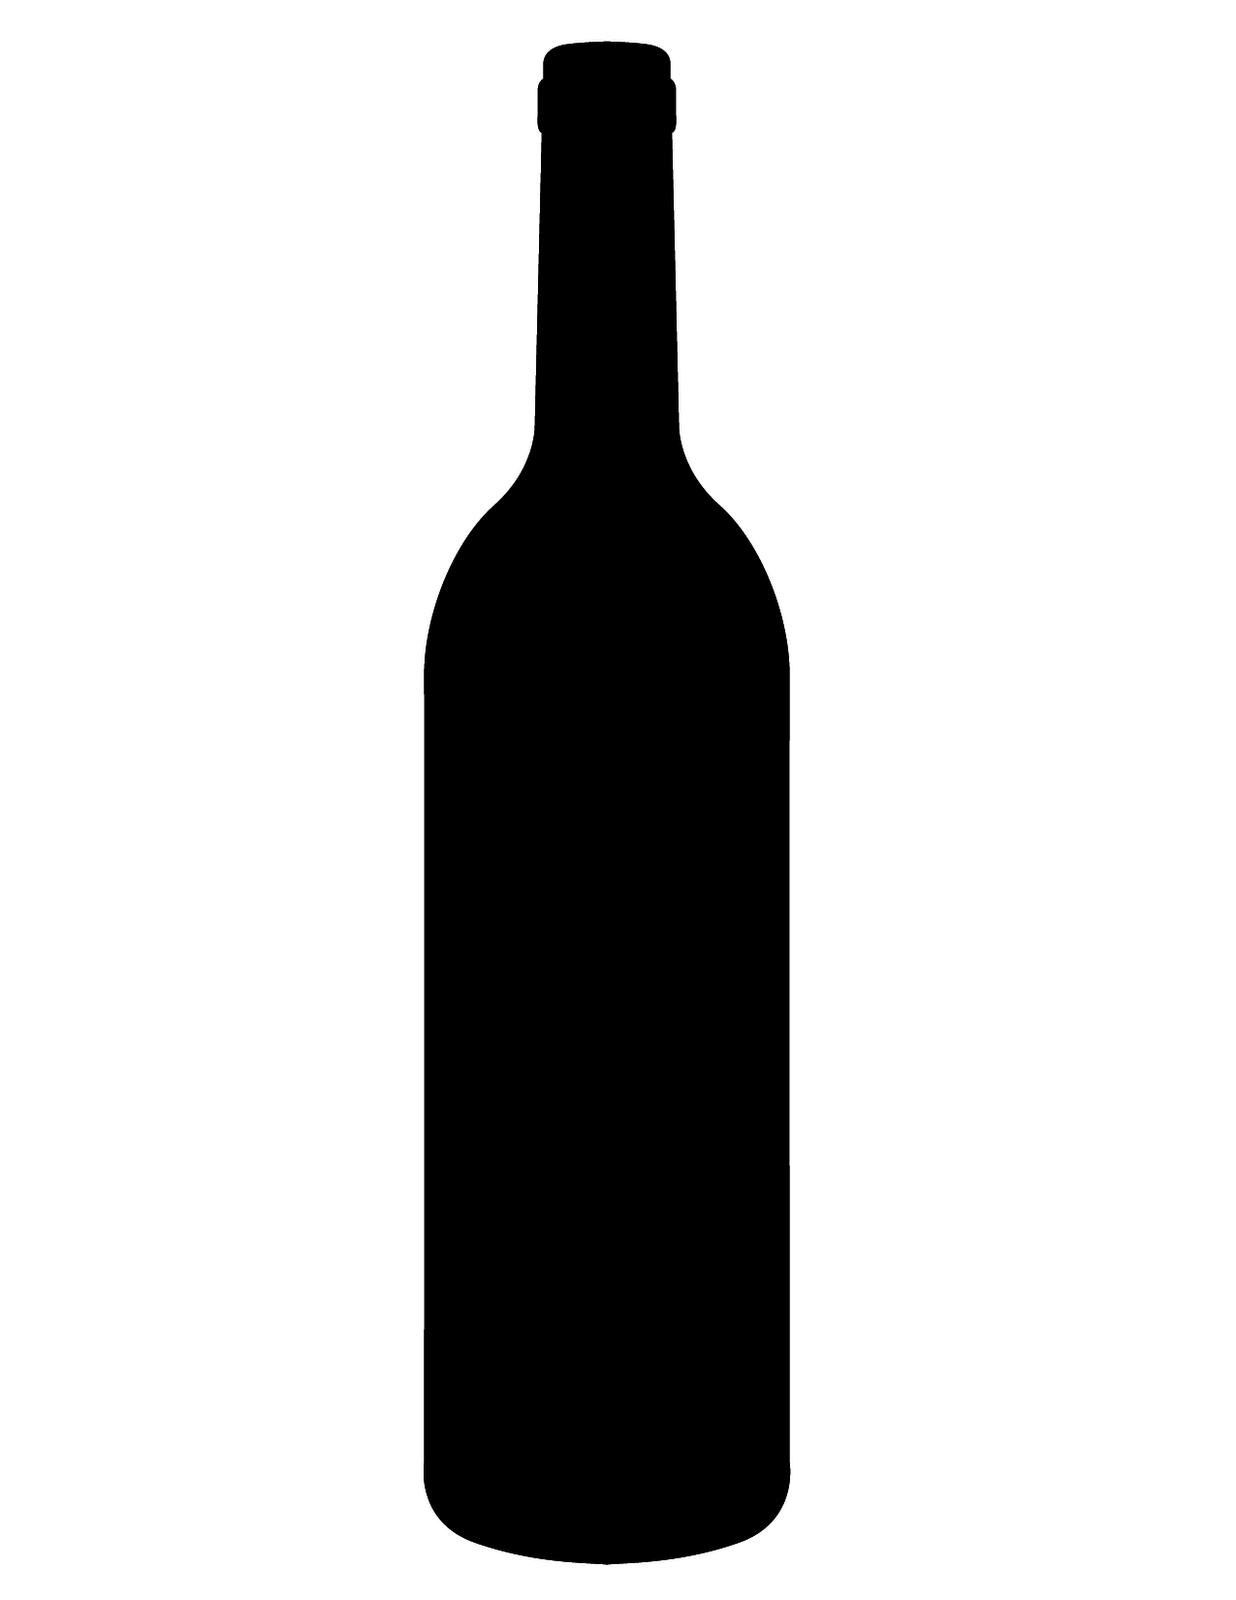 $60 Bottle (Knights of Columbus)